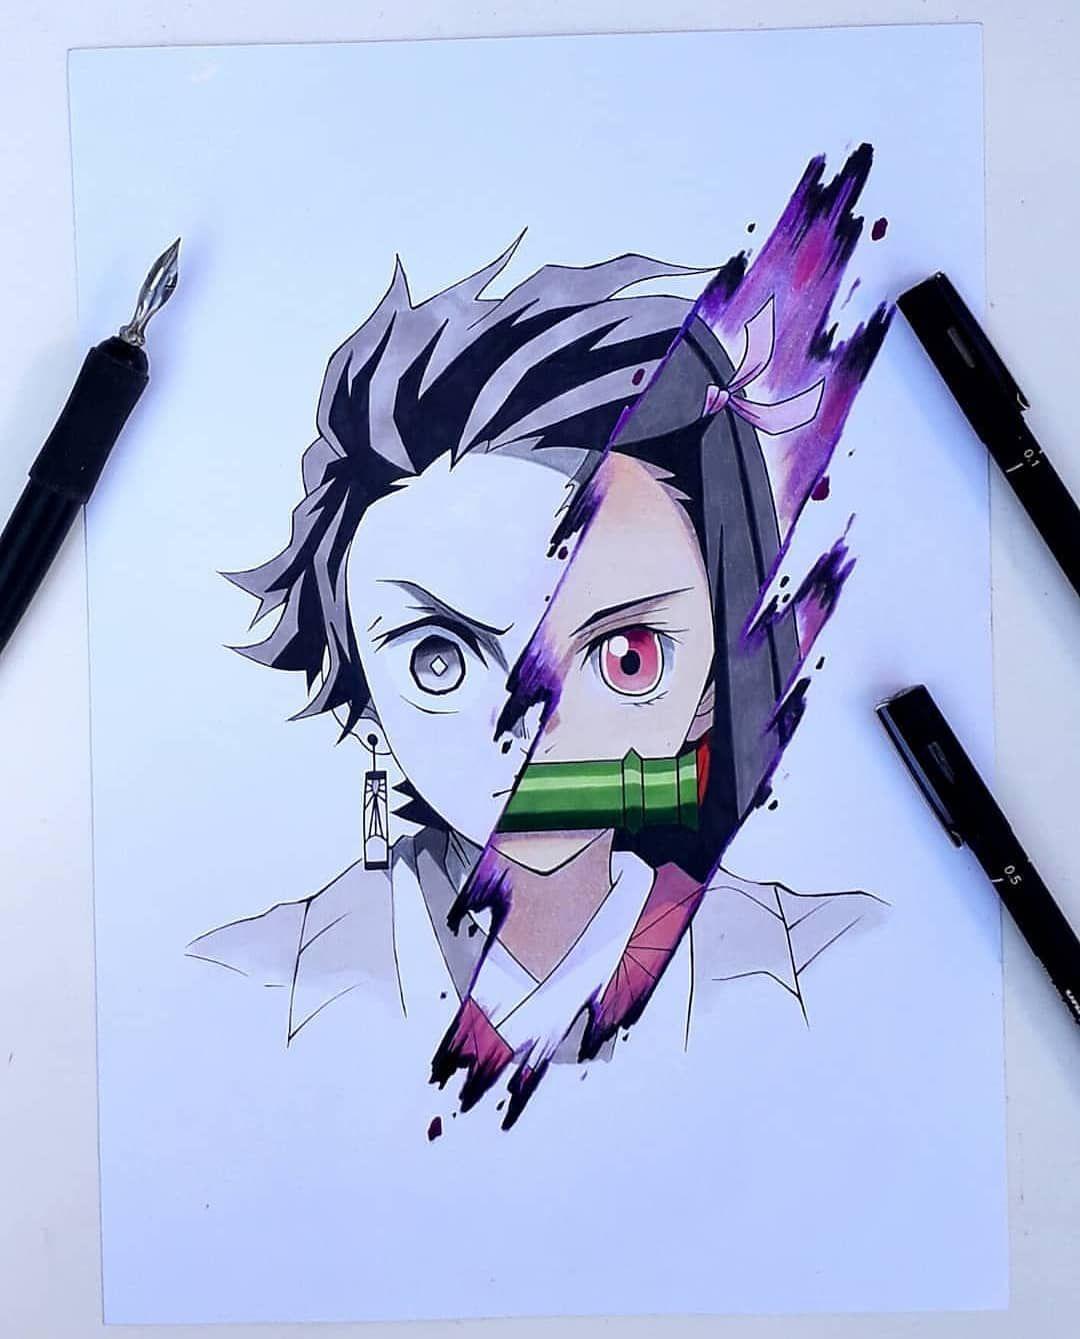 Animeart Art Drawing Manga Mangadrawing Animedrawing Anime Desenho De Anime Desenhos De Anime Desenhos Escuros